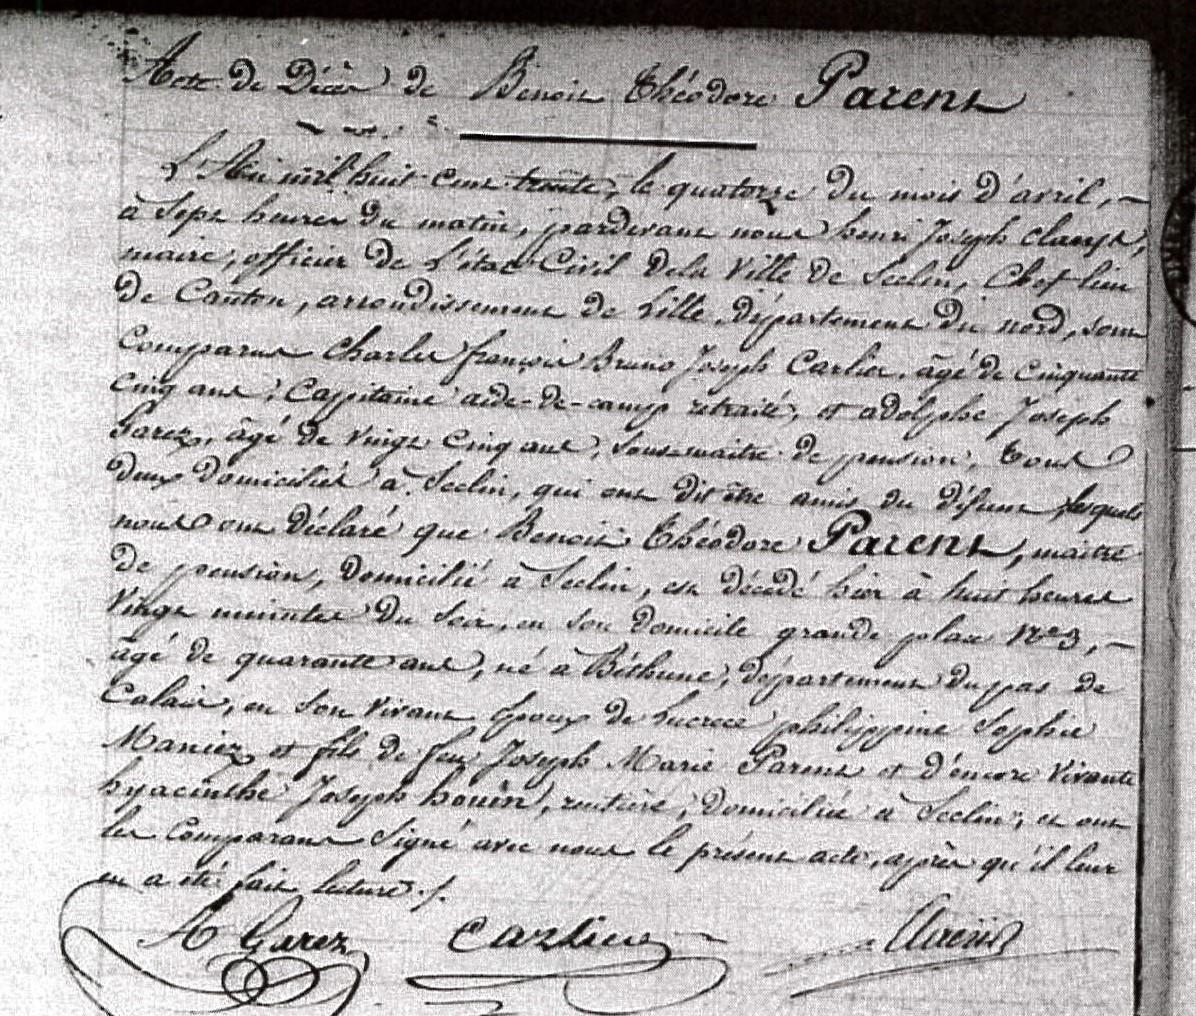 Etat-Civil de Seclin (ADN 1815-1832) - acte de décès de Benoit PARENT